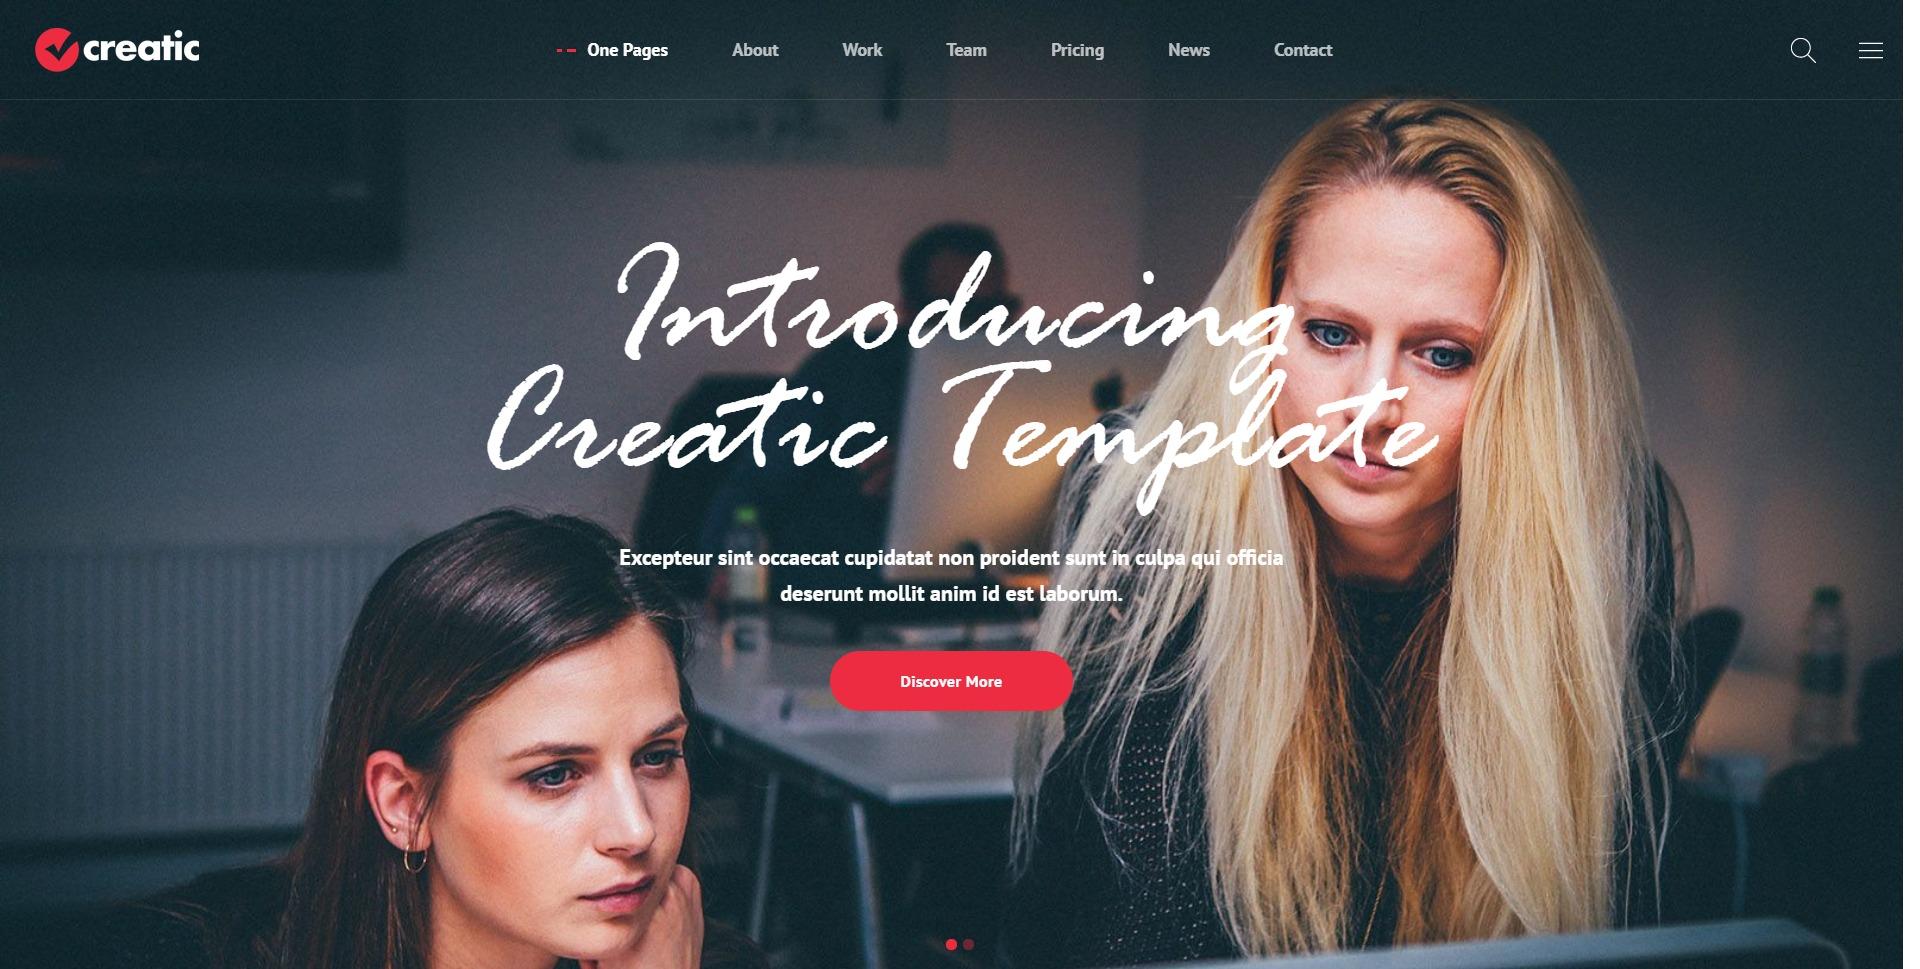 Creatic-创意单页个人简历WordPress主题